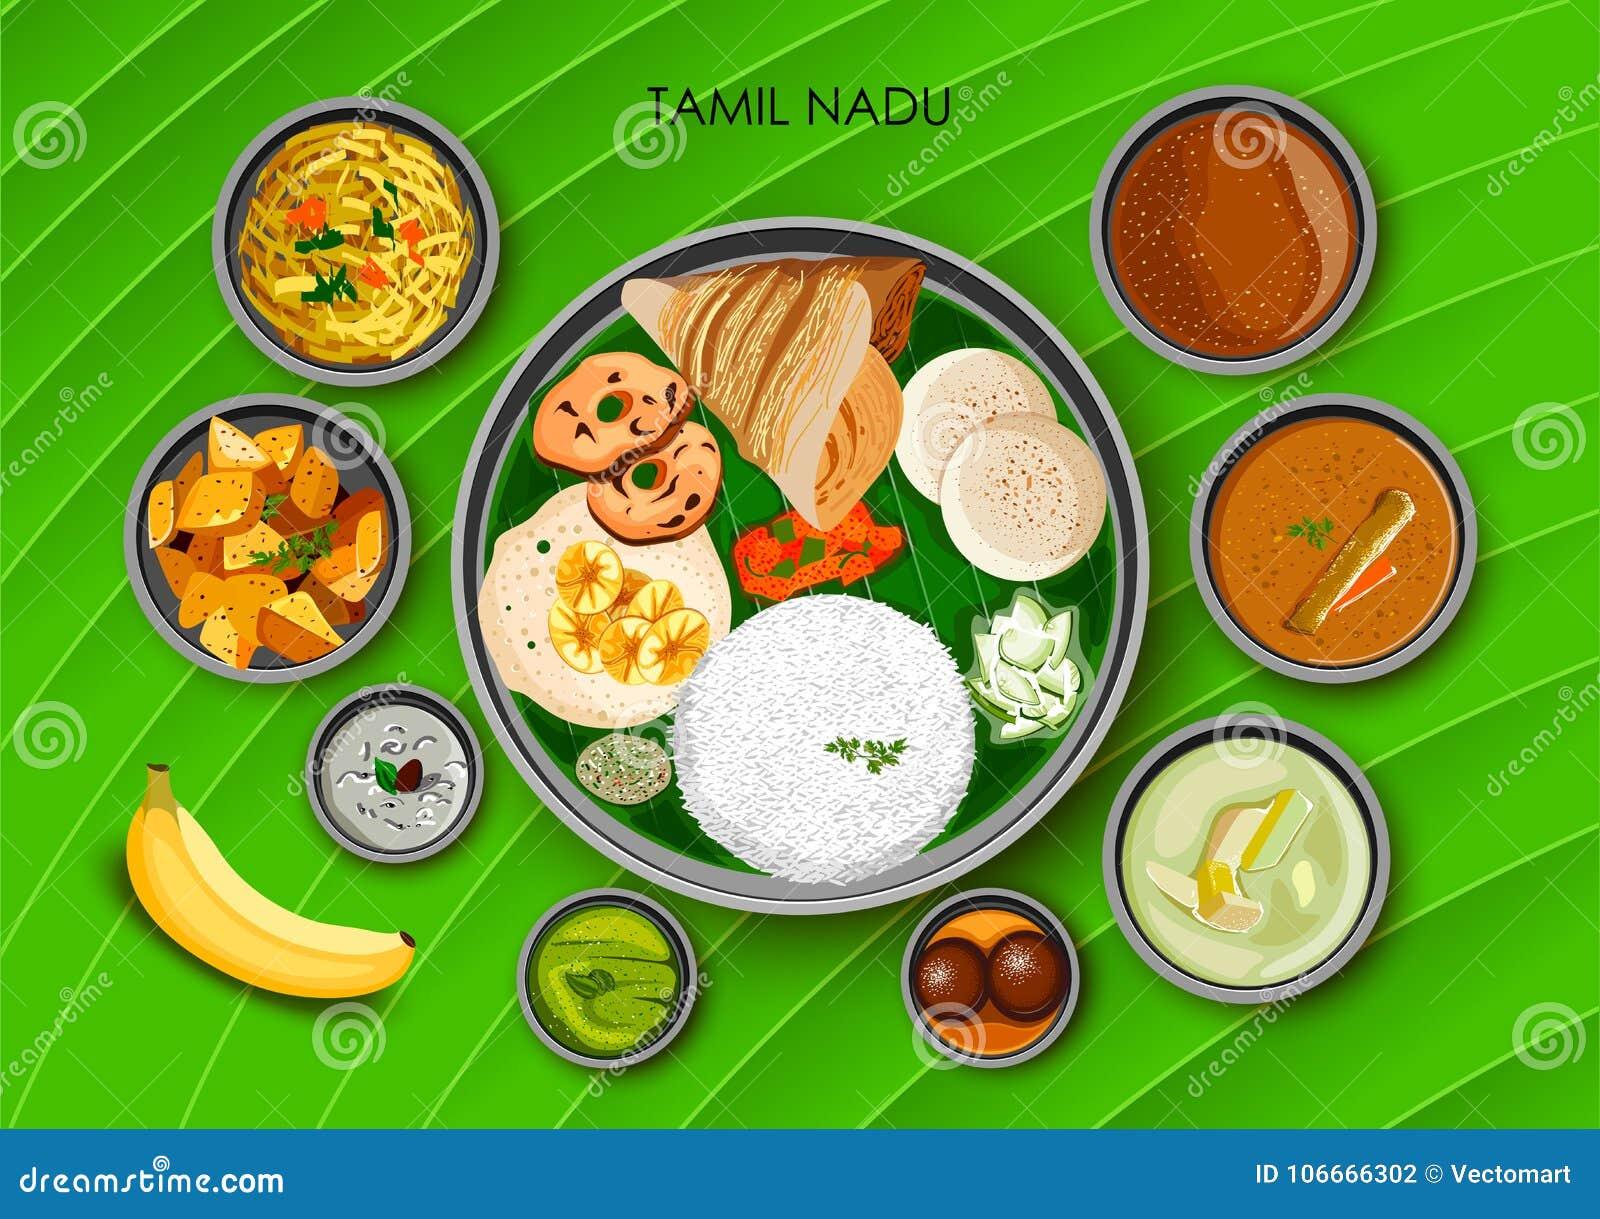 Best Food In Chidambaram